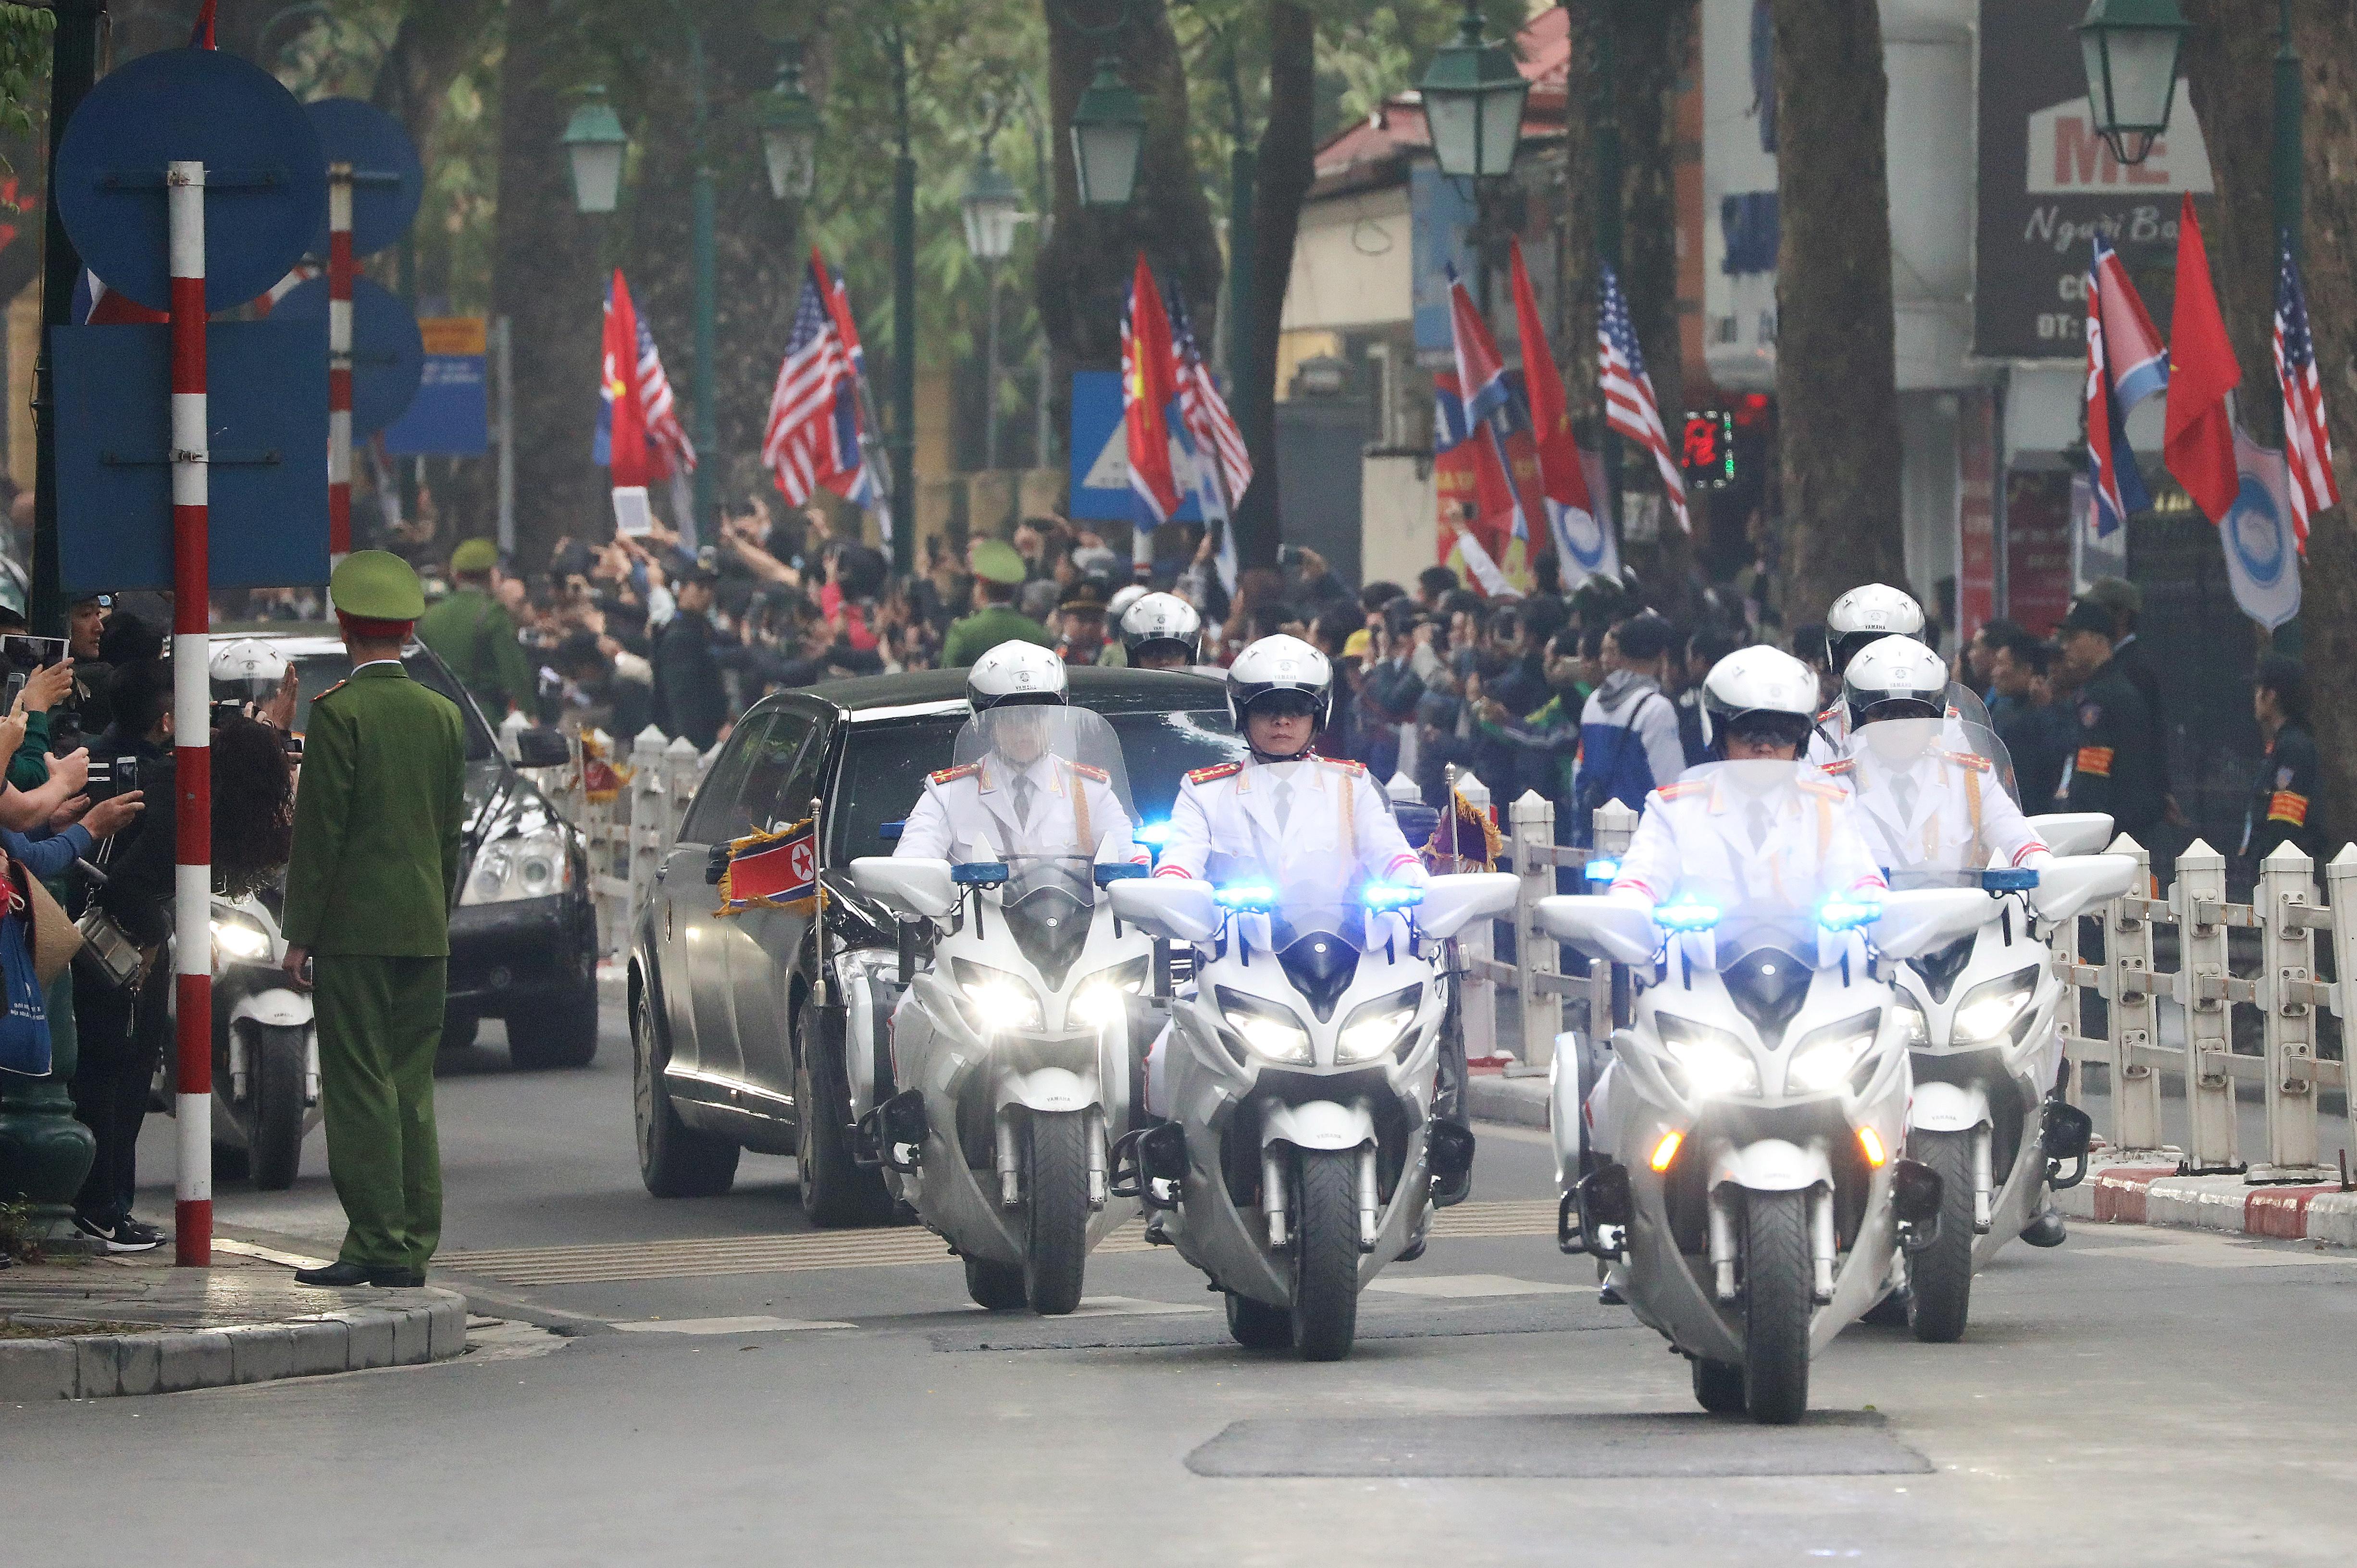 The motorcade of North Korean leader Kim Jong Un is seen passing the Opera House, ahead of a second summit with U.S. President Donald Trump, in Hanoi, Vietnam February 26, 2019. REUTERS/Ann Wang - RC1CDBBCCDA0